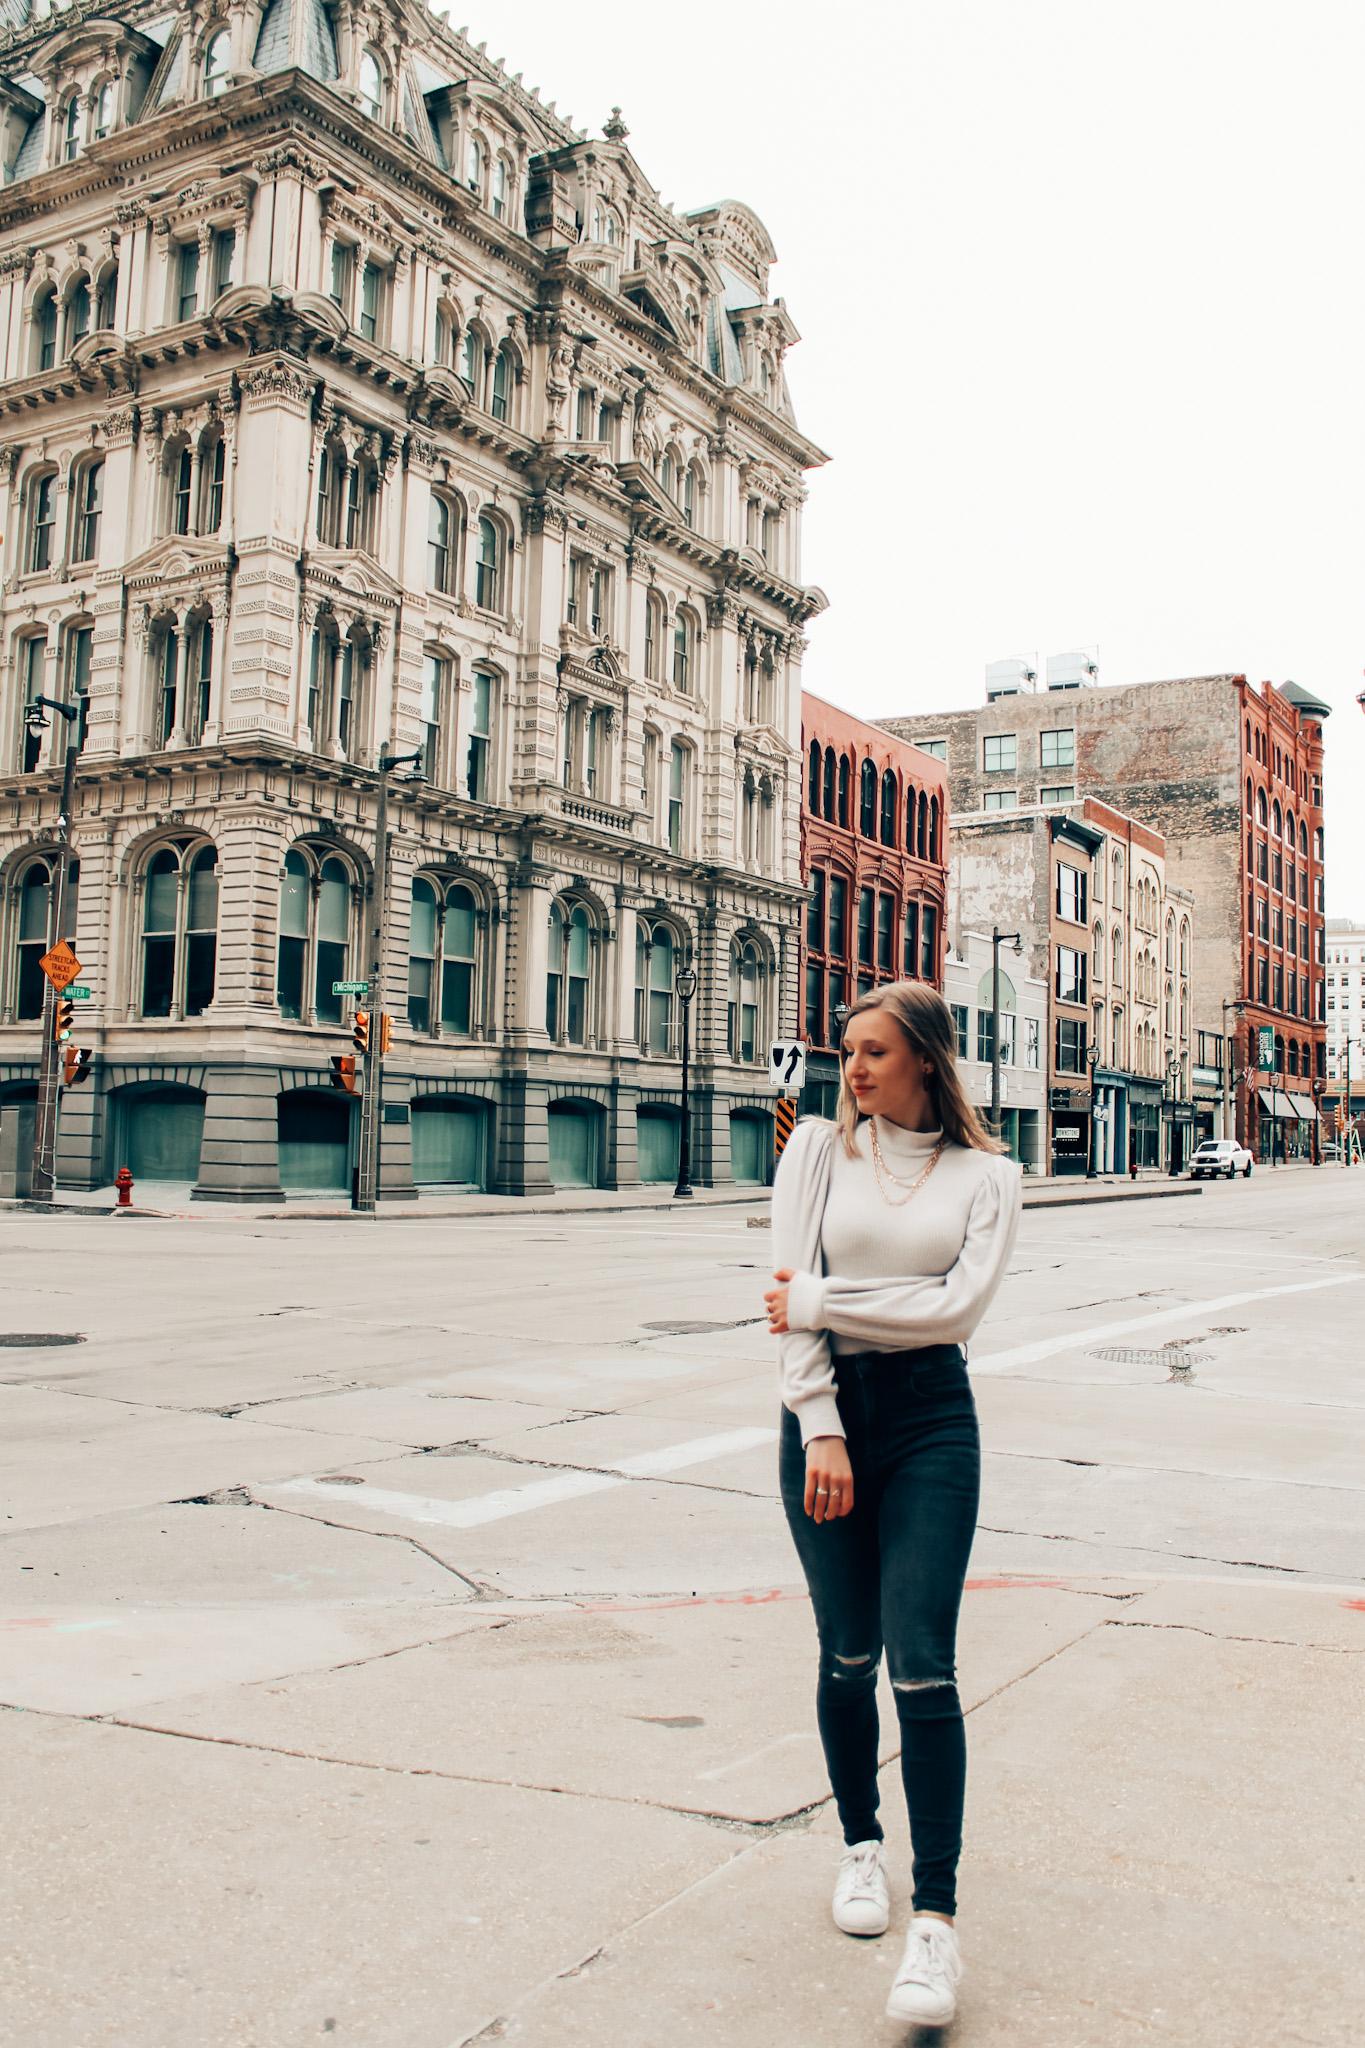 Exploring the city of Milwaukee